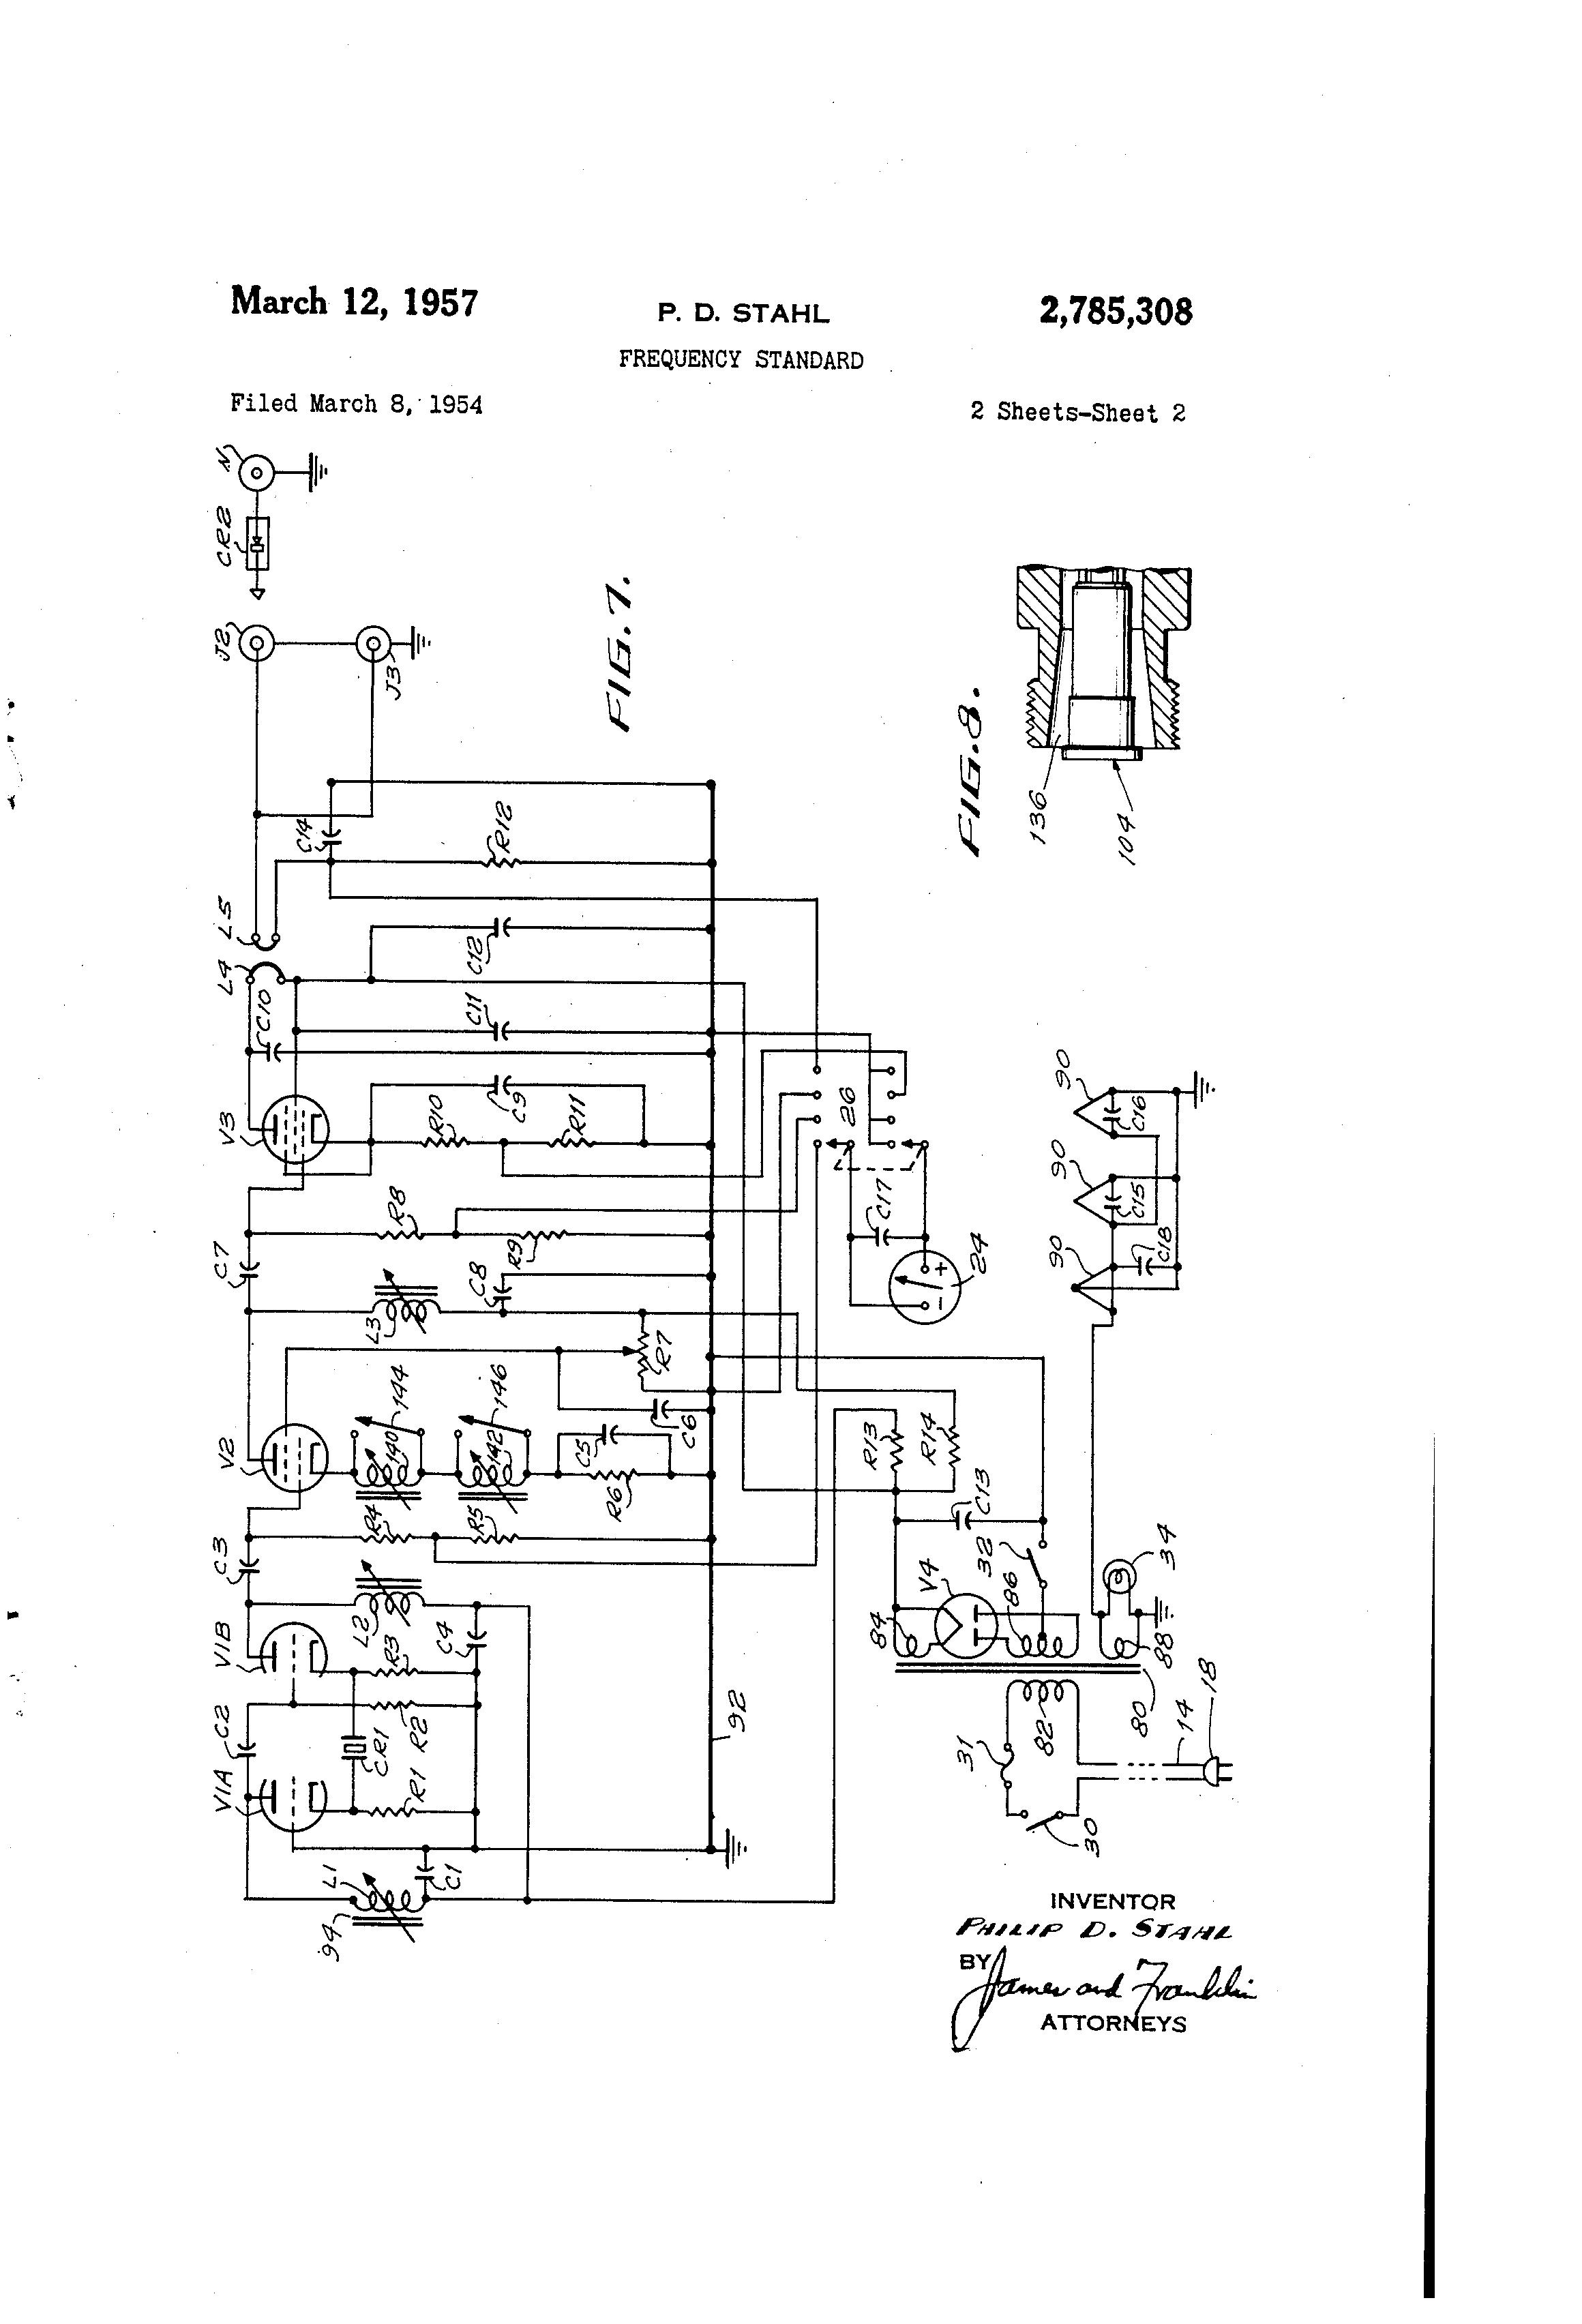 2 Speed Hoist Pendant Wiring Diagram Six Wire Capacitor Diagram Audi A3 Citroen Wirings1 Jeanjaures37 Fr